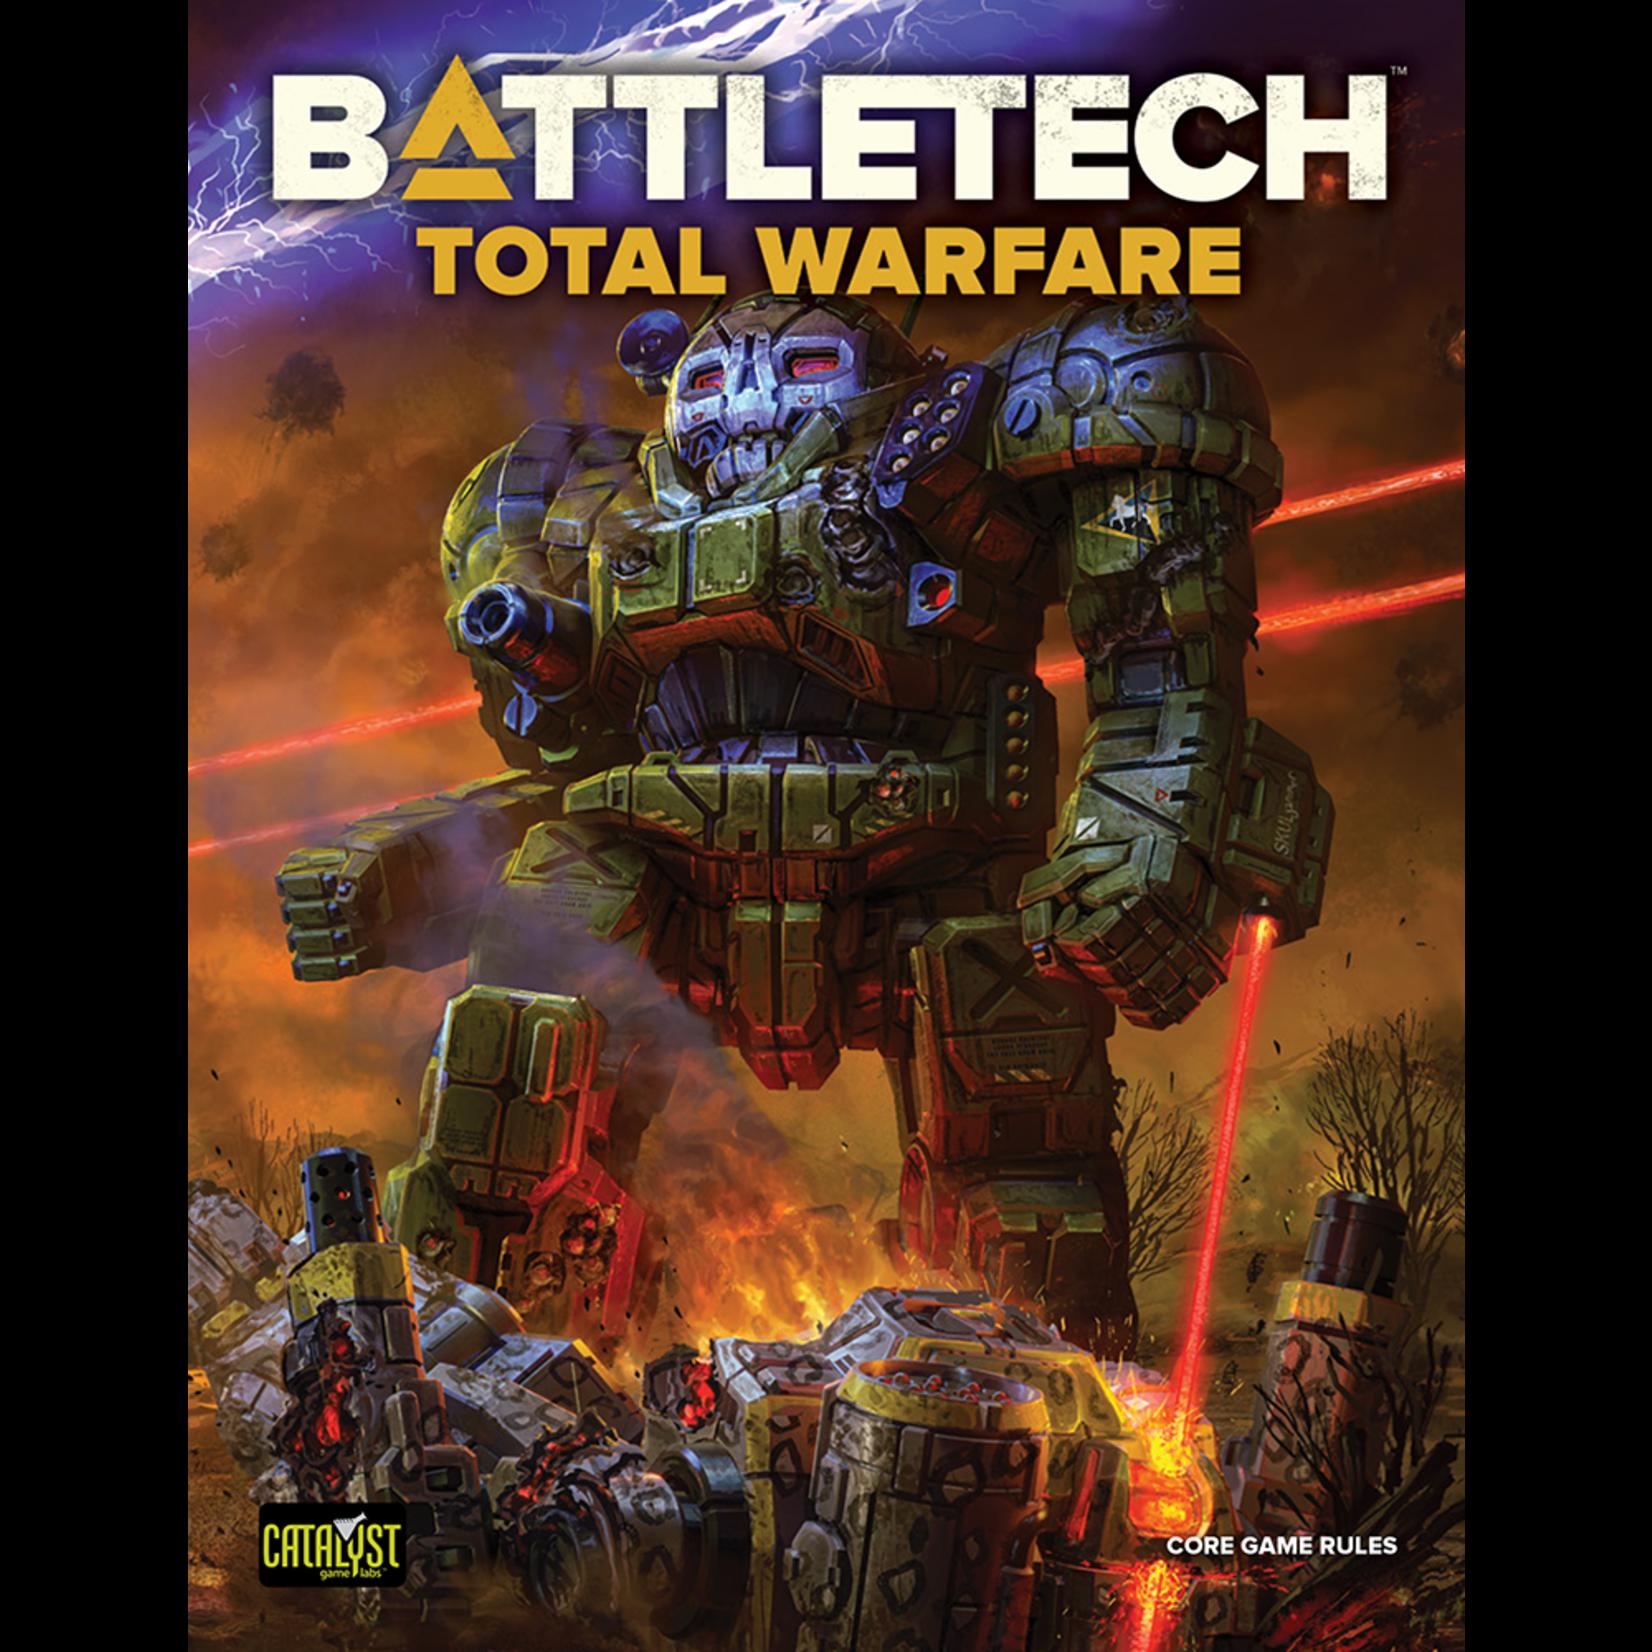 Battletech Total Warfare 2nd edition